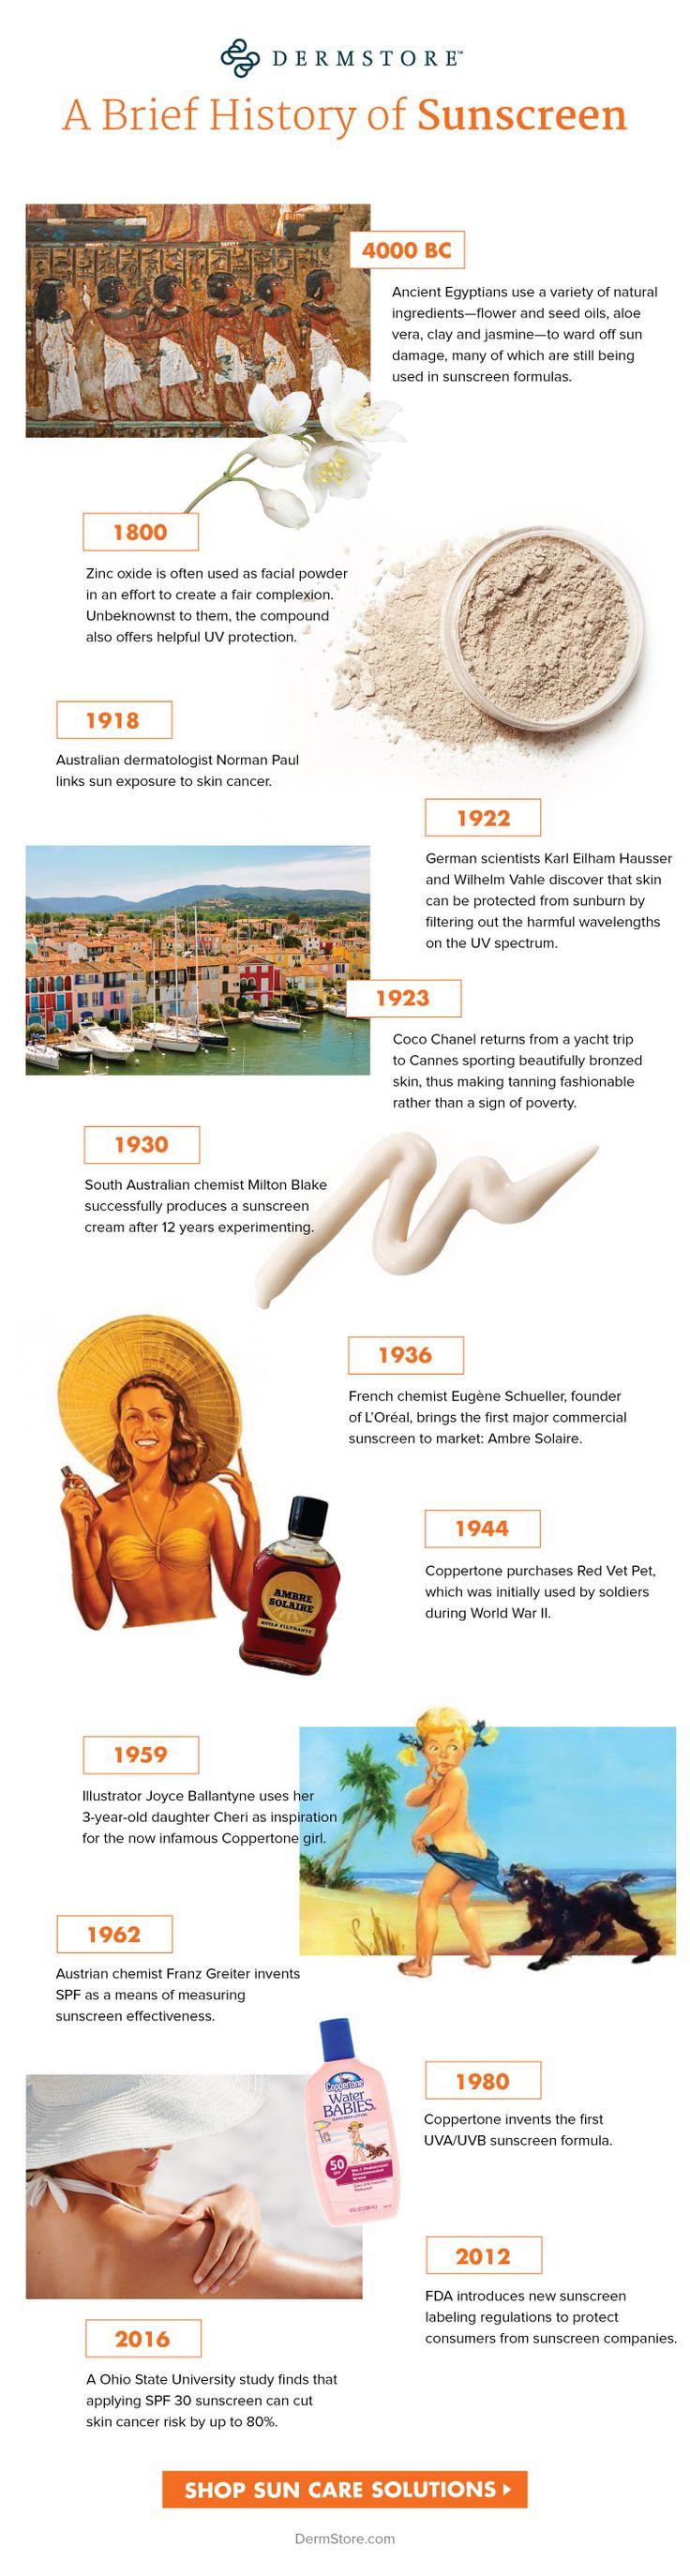 History of Sunscreen - DermStore